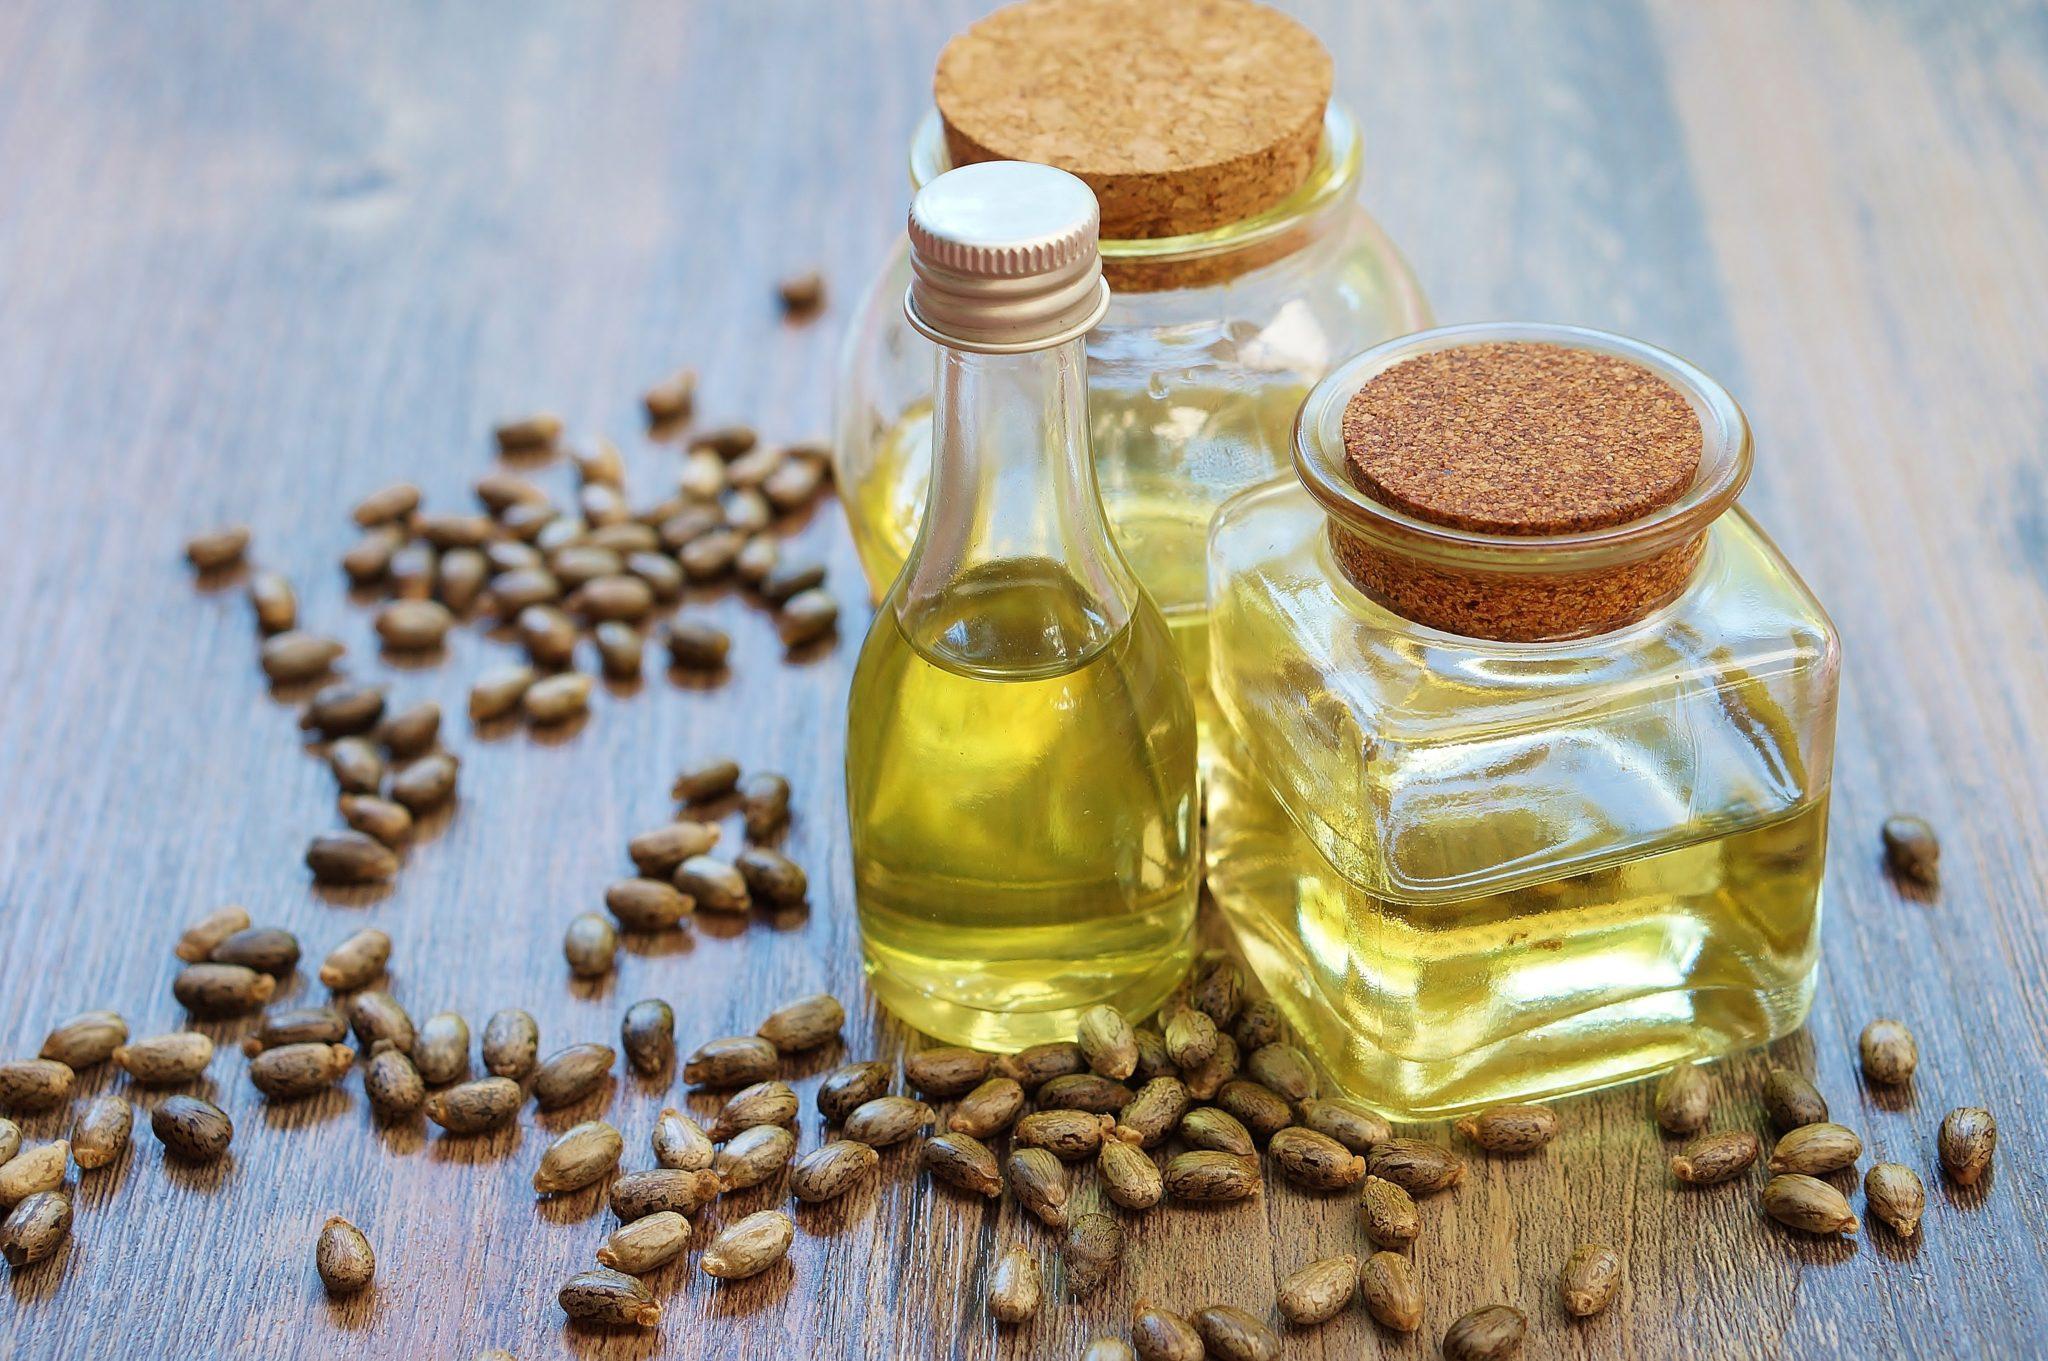 castor oil for mosquito control